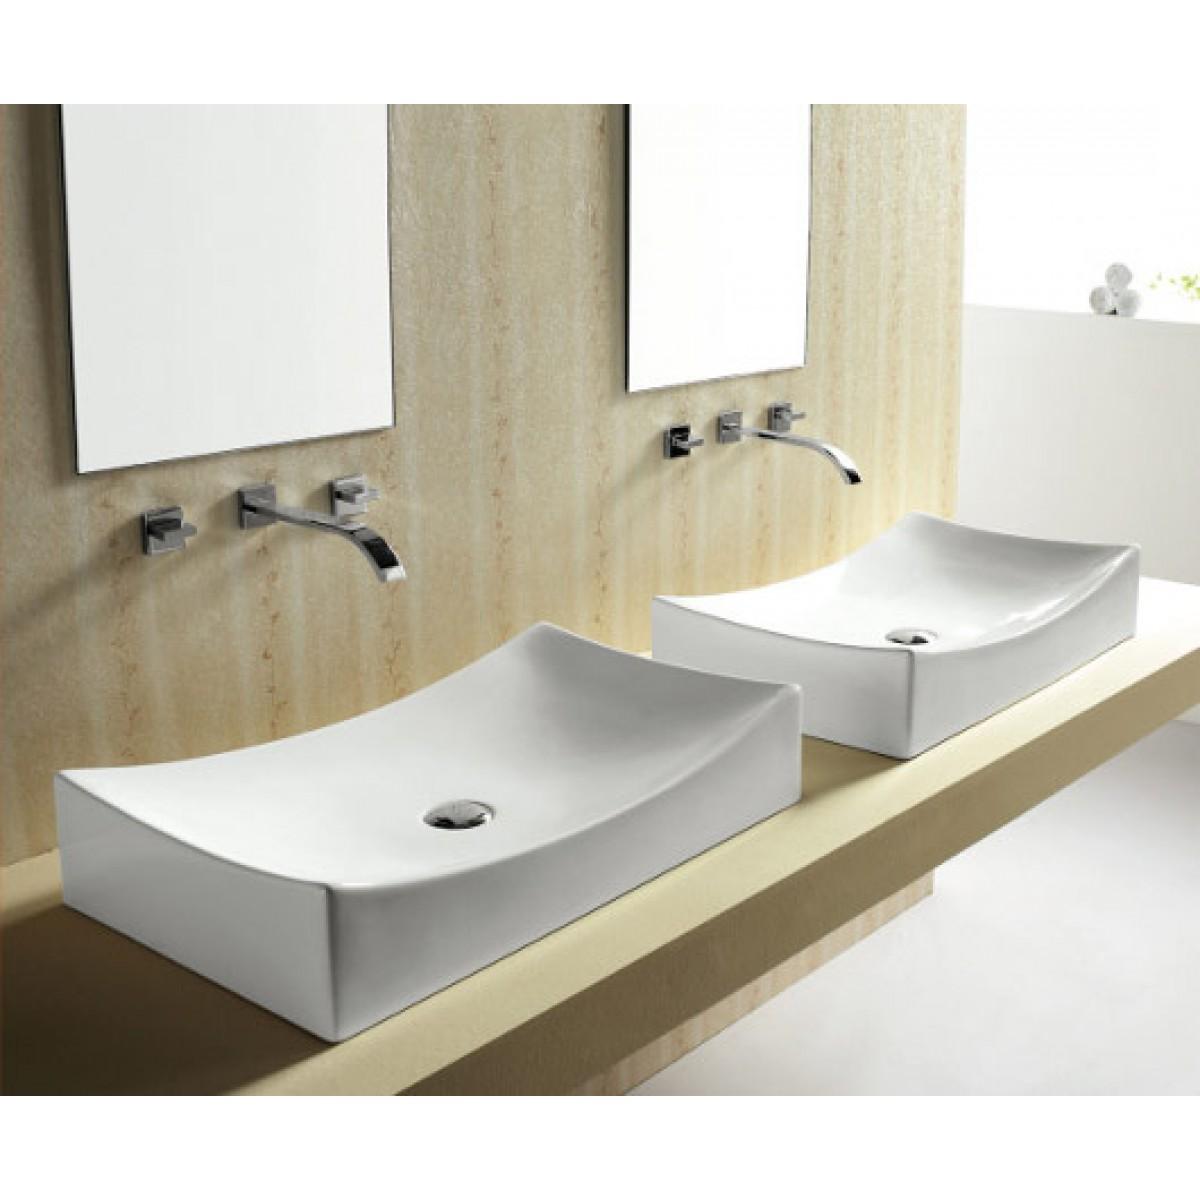 european style porcelain ceramic countertop bathroom vessel sink 26 x 15 1 2 x 5 1 2 inch